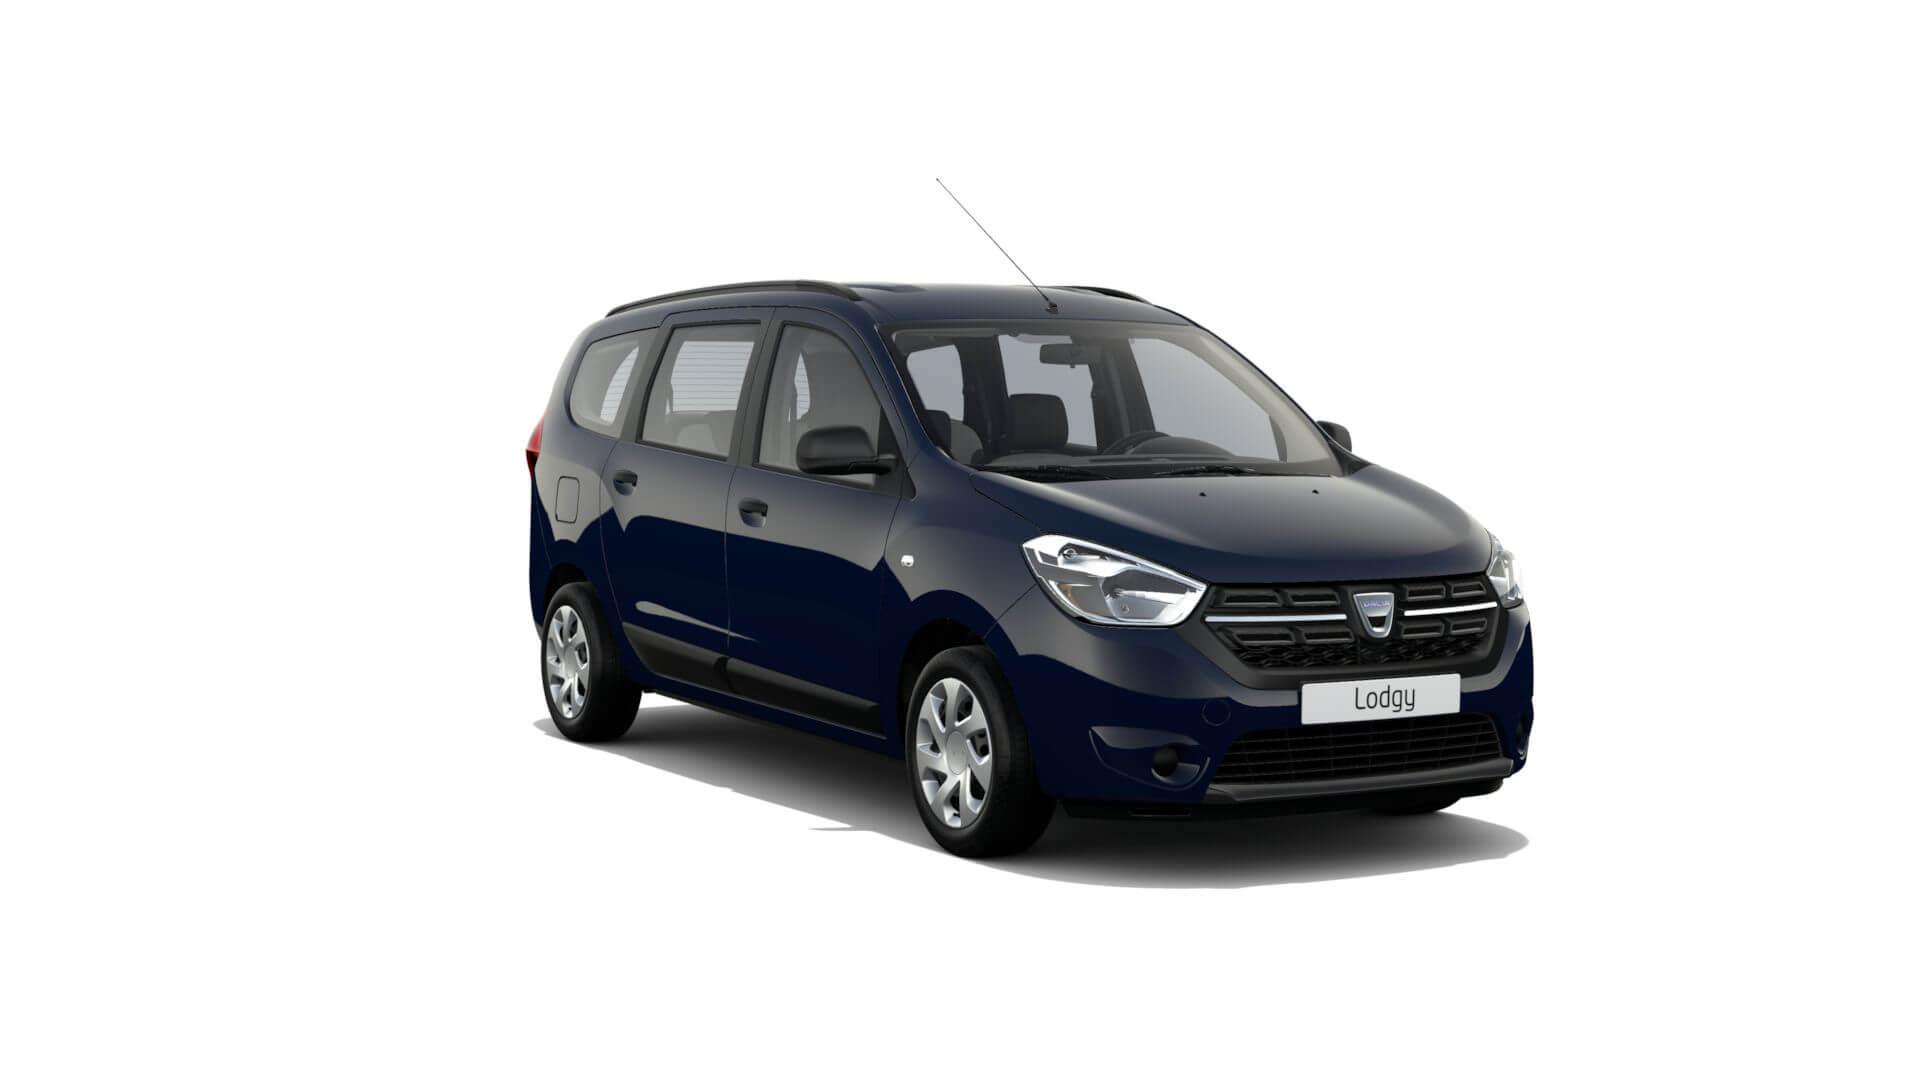 Automodell blau - Dacia Lodgy NFZ - Renault Ahrens Hannover